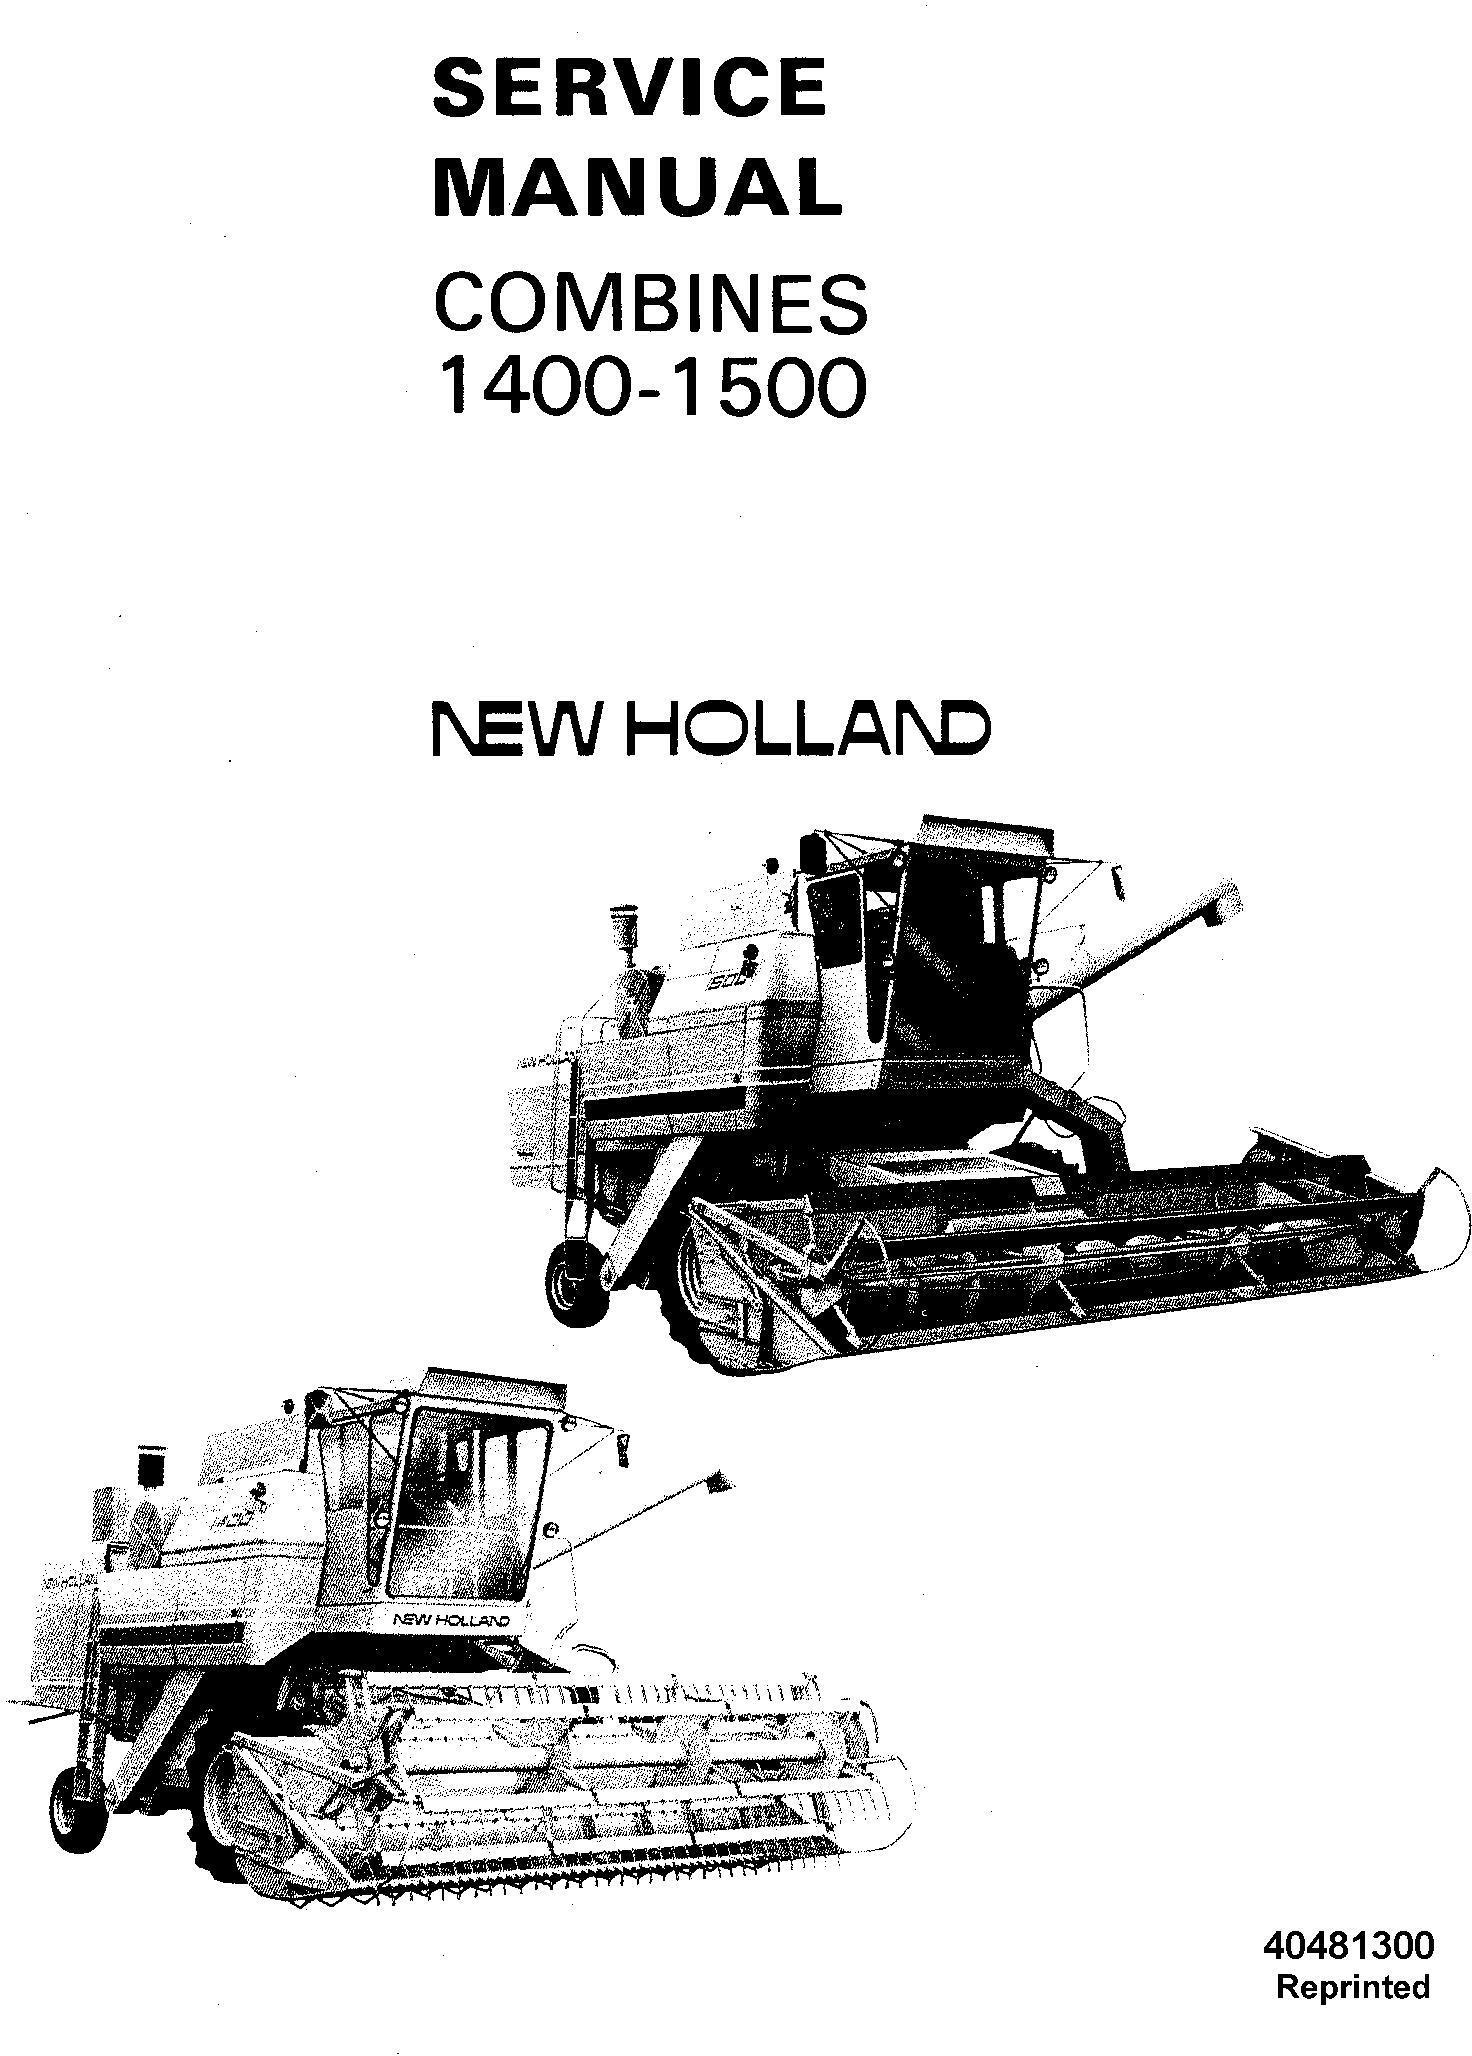 New Holland 1400, 1500 Combine Service Manual / Deere